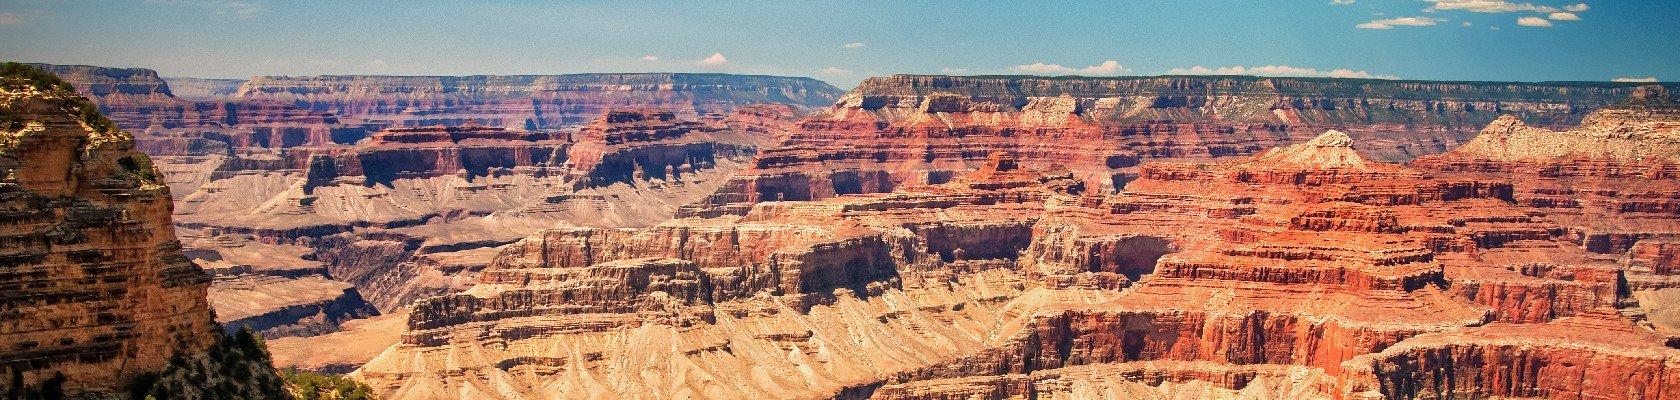 Grand Canyon Nationaal Park